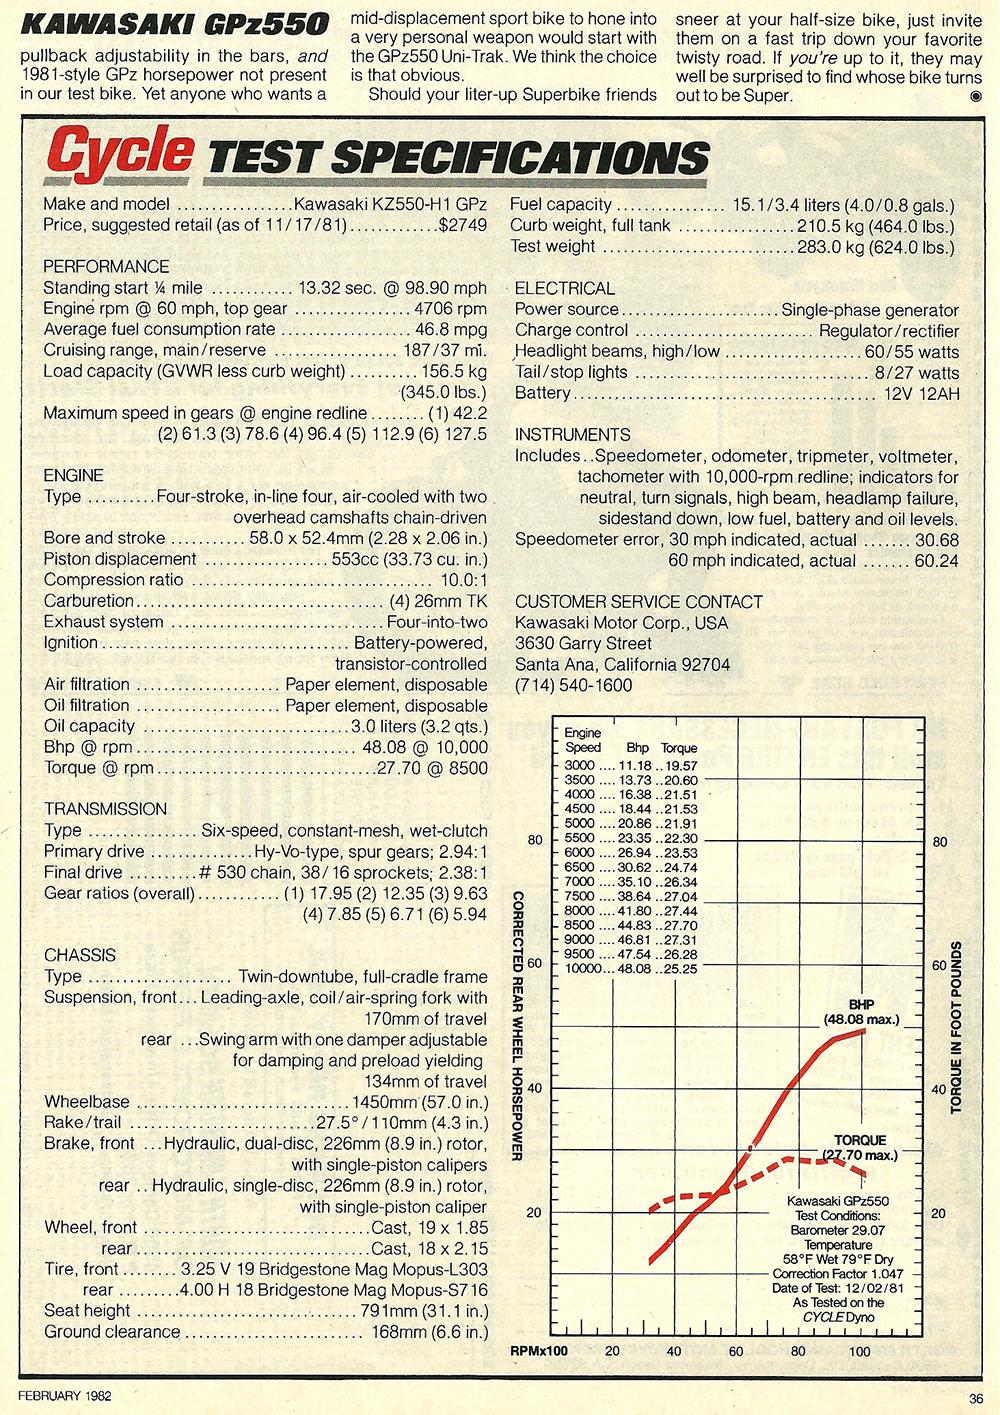 1982 Kawasaki GPz550 road test 08.jpg